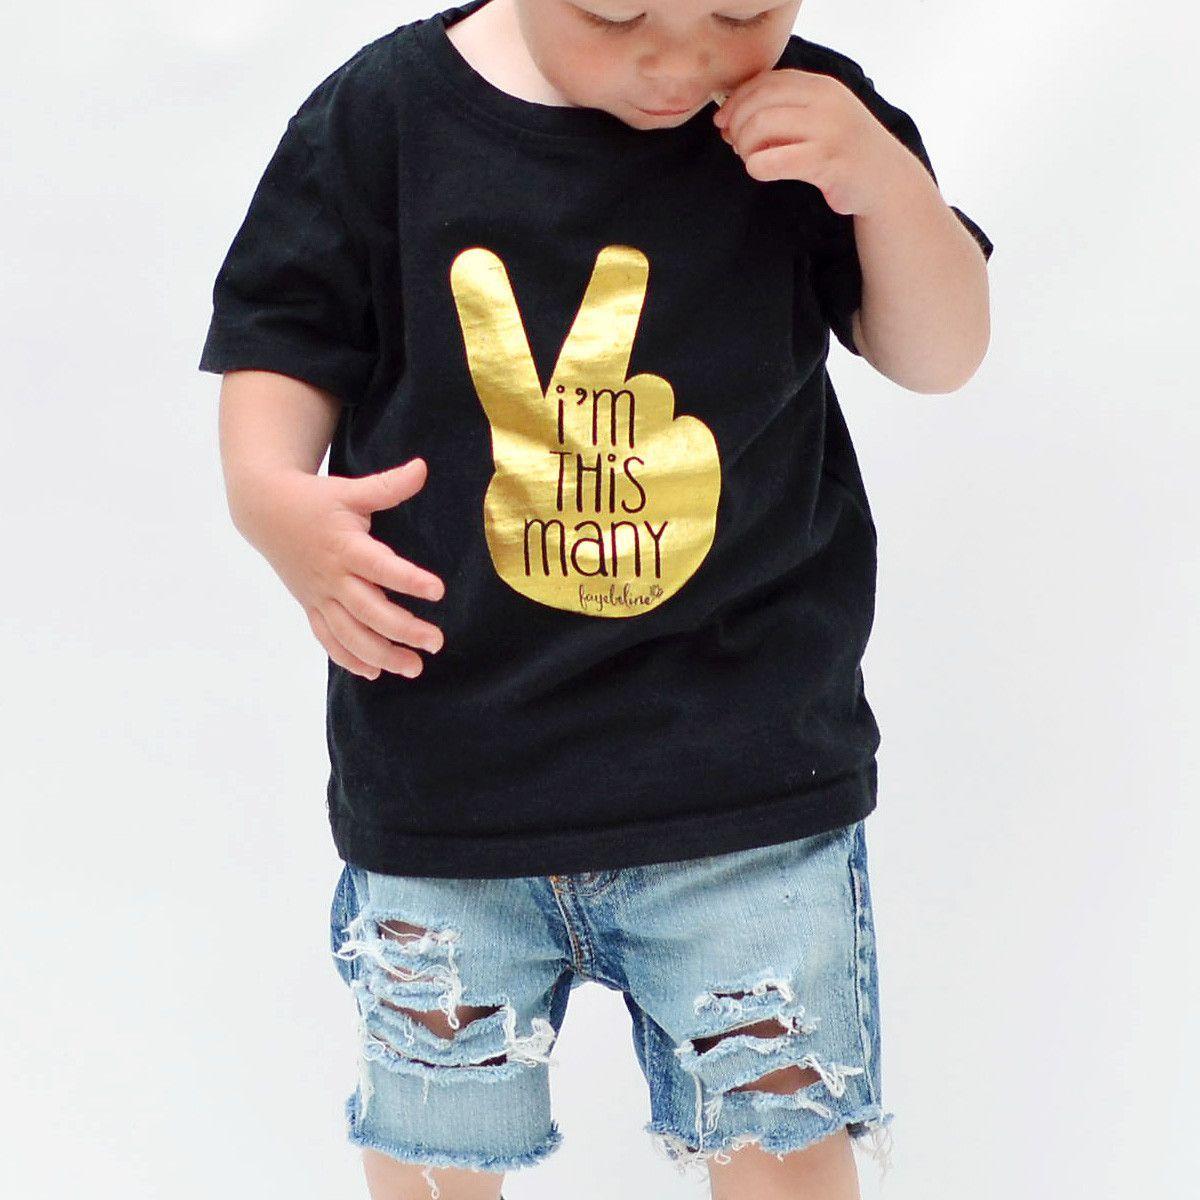 Im black t shirt -  I M This Many Two Year Old Birthday T Shirt Black